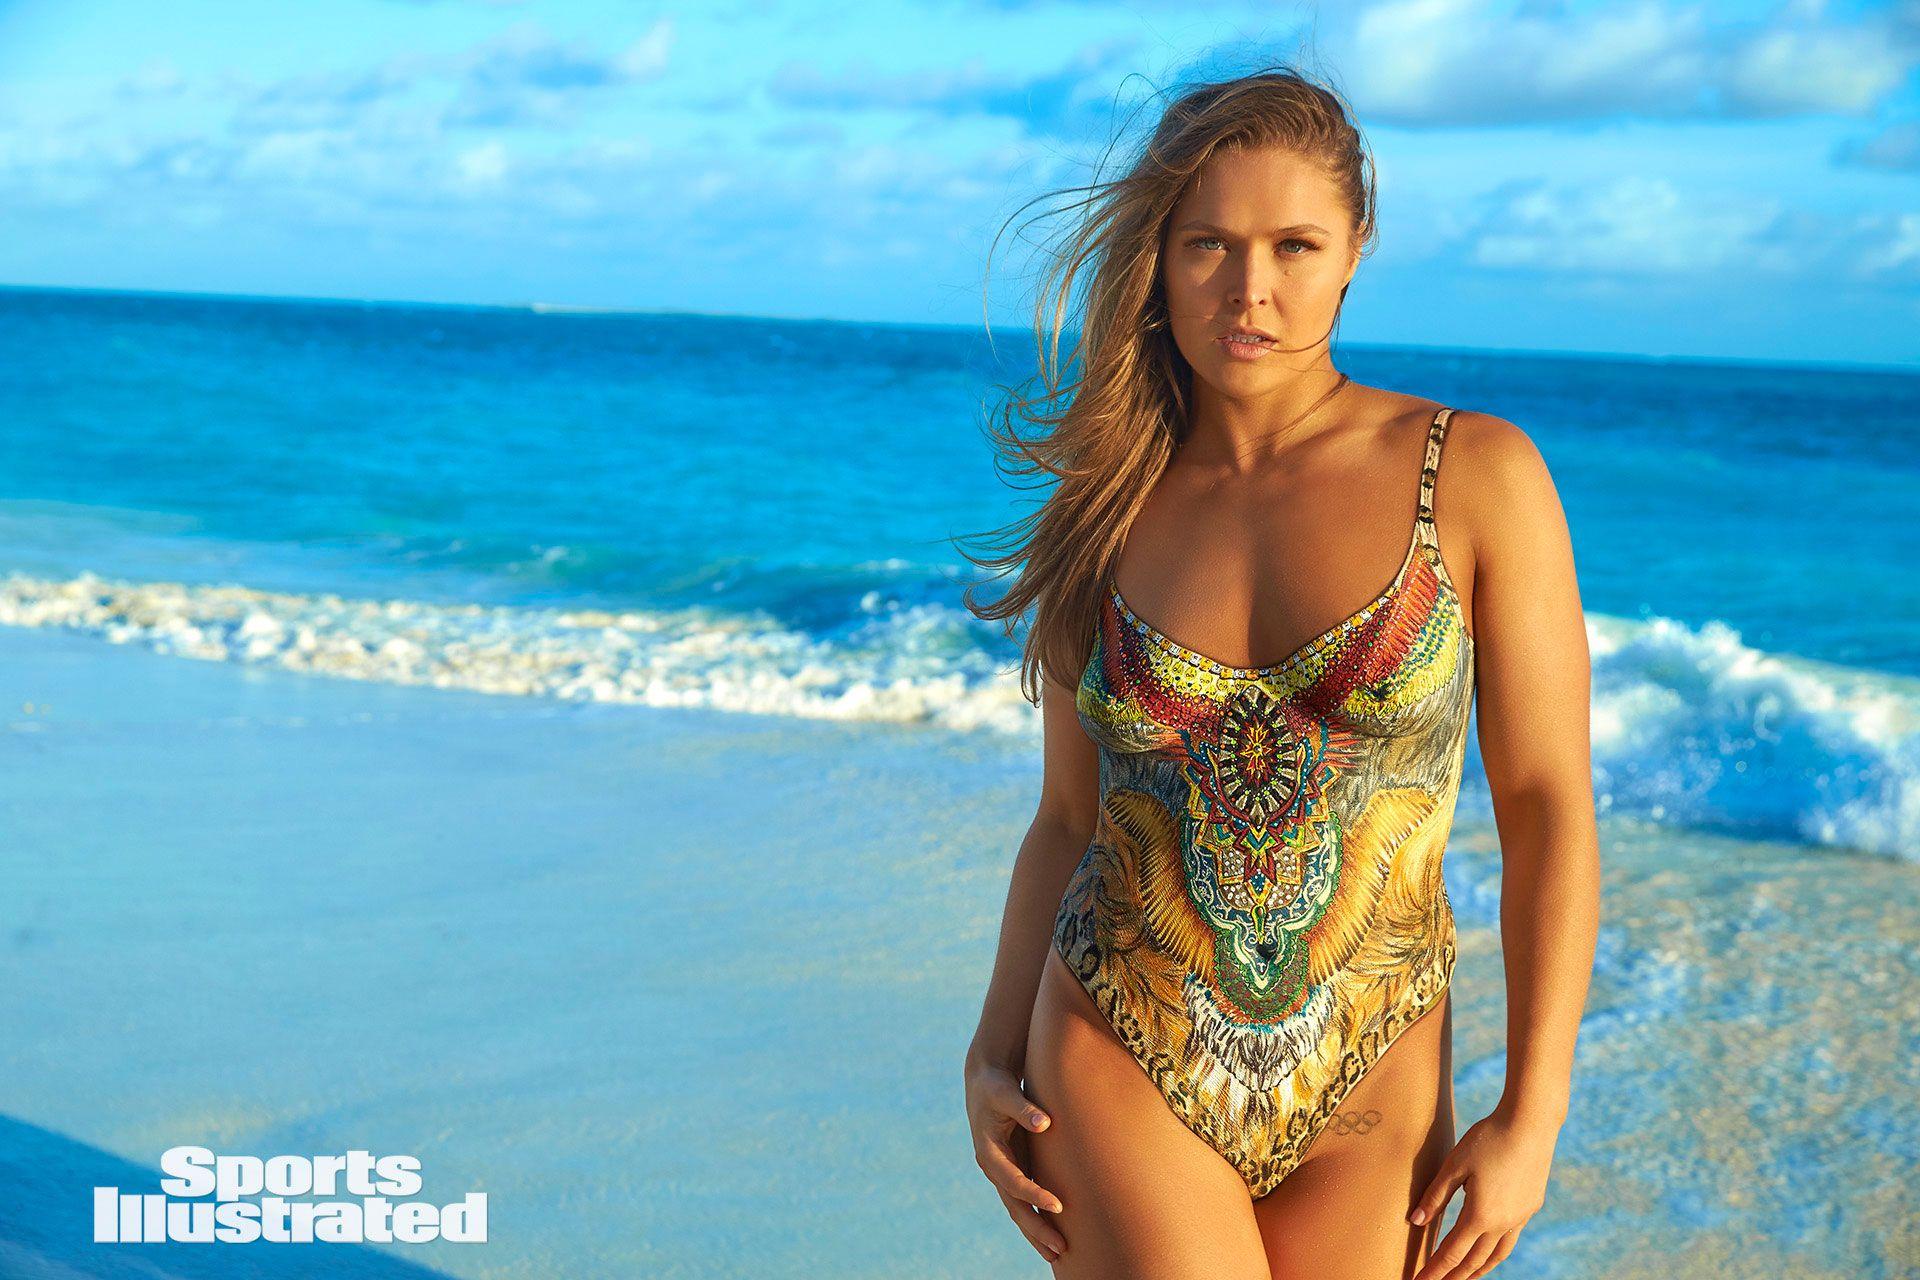 Ronda Rousey leaked fappening photo